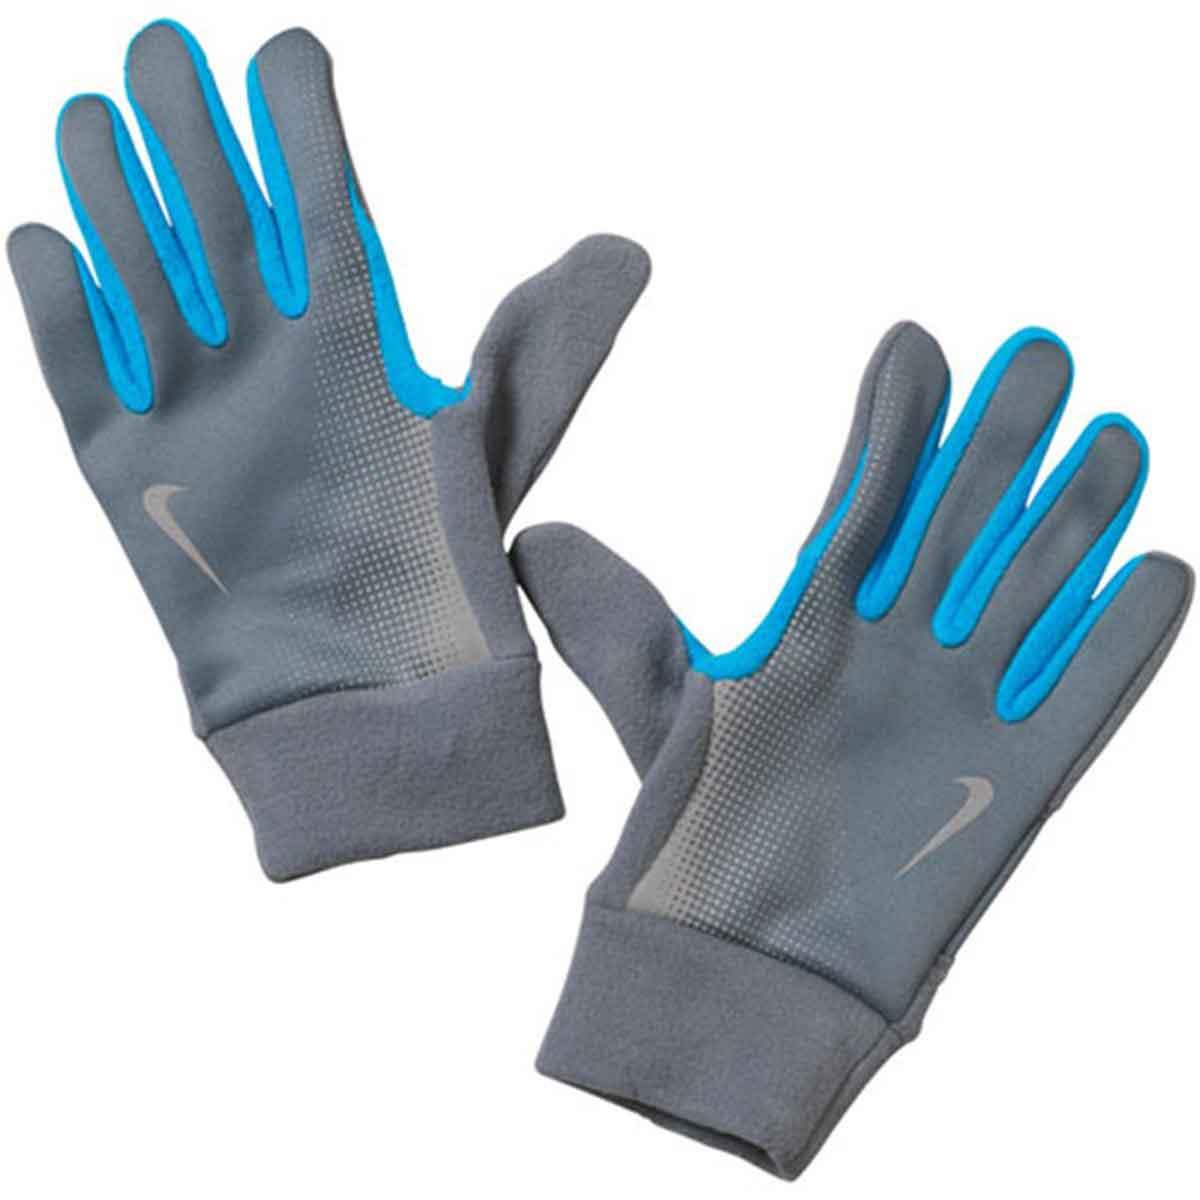 bd3de5d6dd4f Buy Nike Mens Tech Thermal Running Gloves Online India